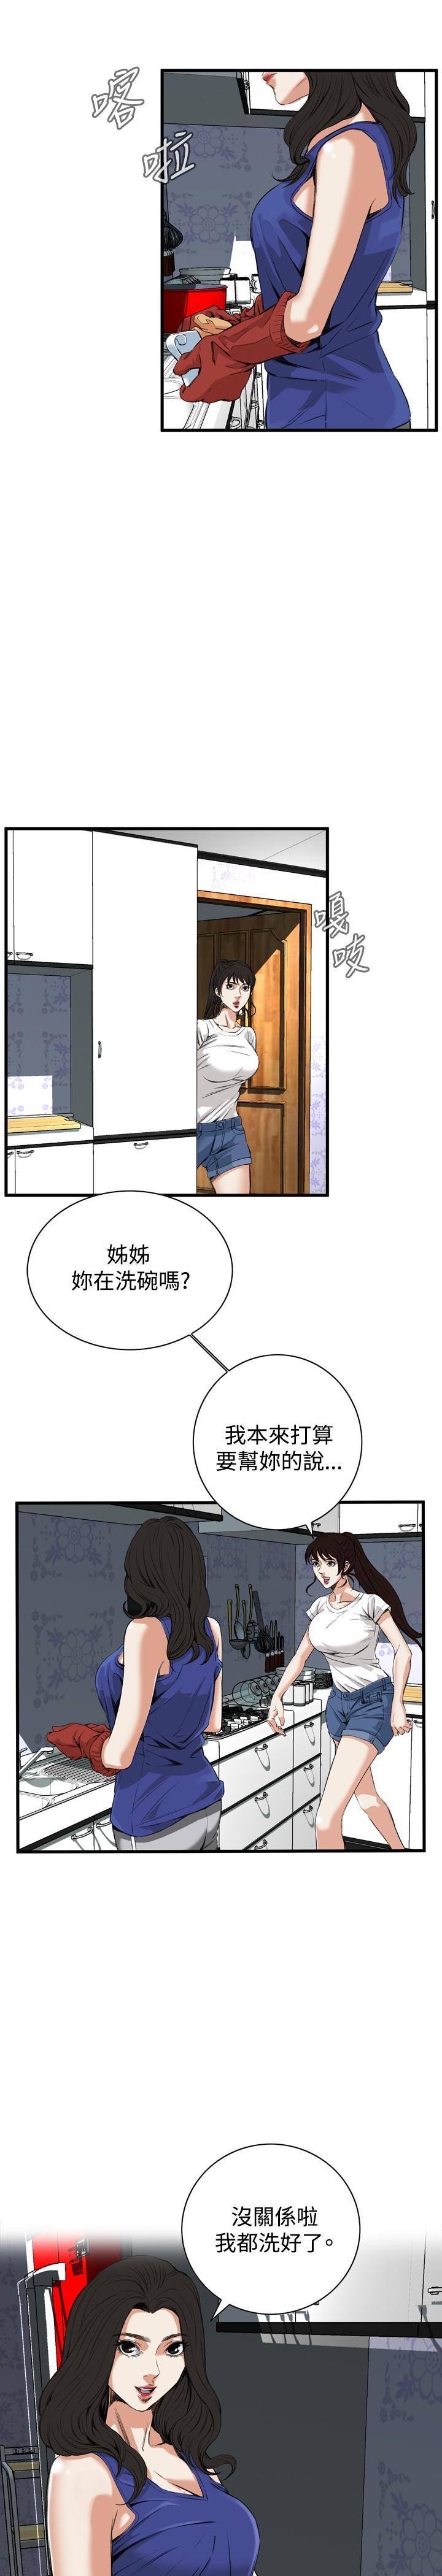 Take a Peek 偷窥 Ch.39~55 [Chinese]中文 211